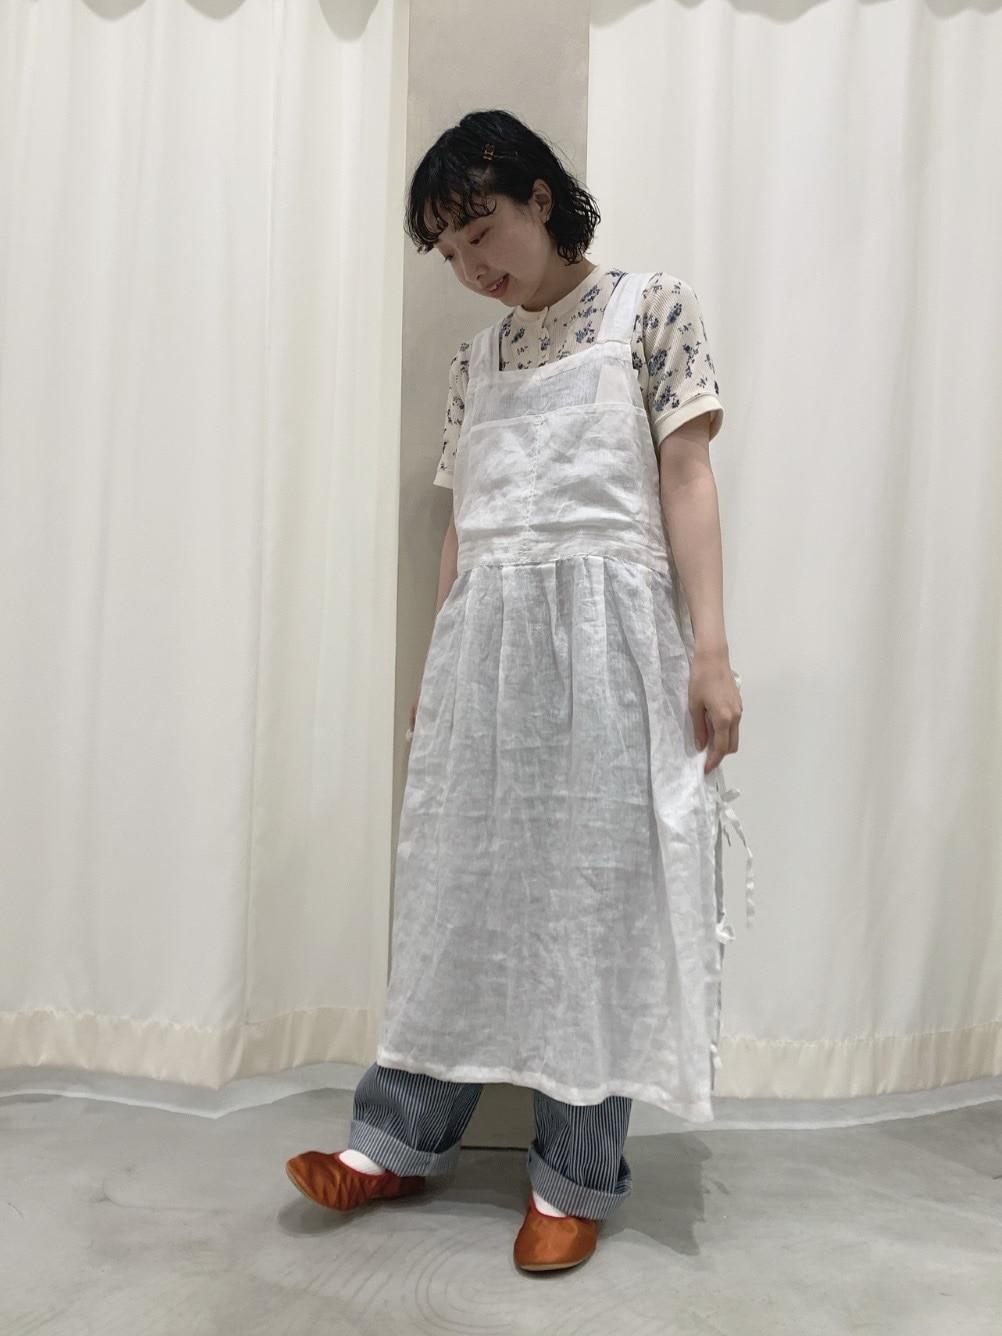 AMB SHOP CHILD WOMAN CHILD WOMAN , PAR ICI ルミネ横浜 身長:158cm 2020.06.20